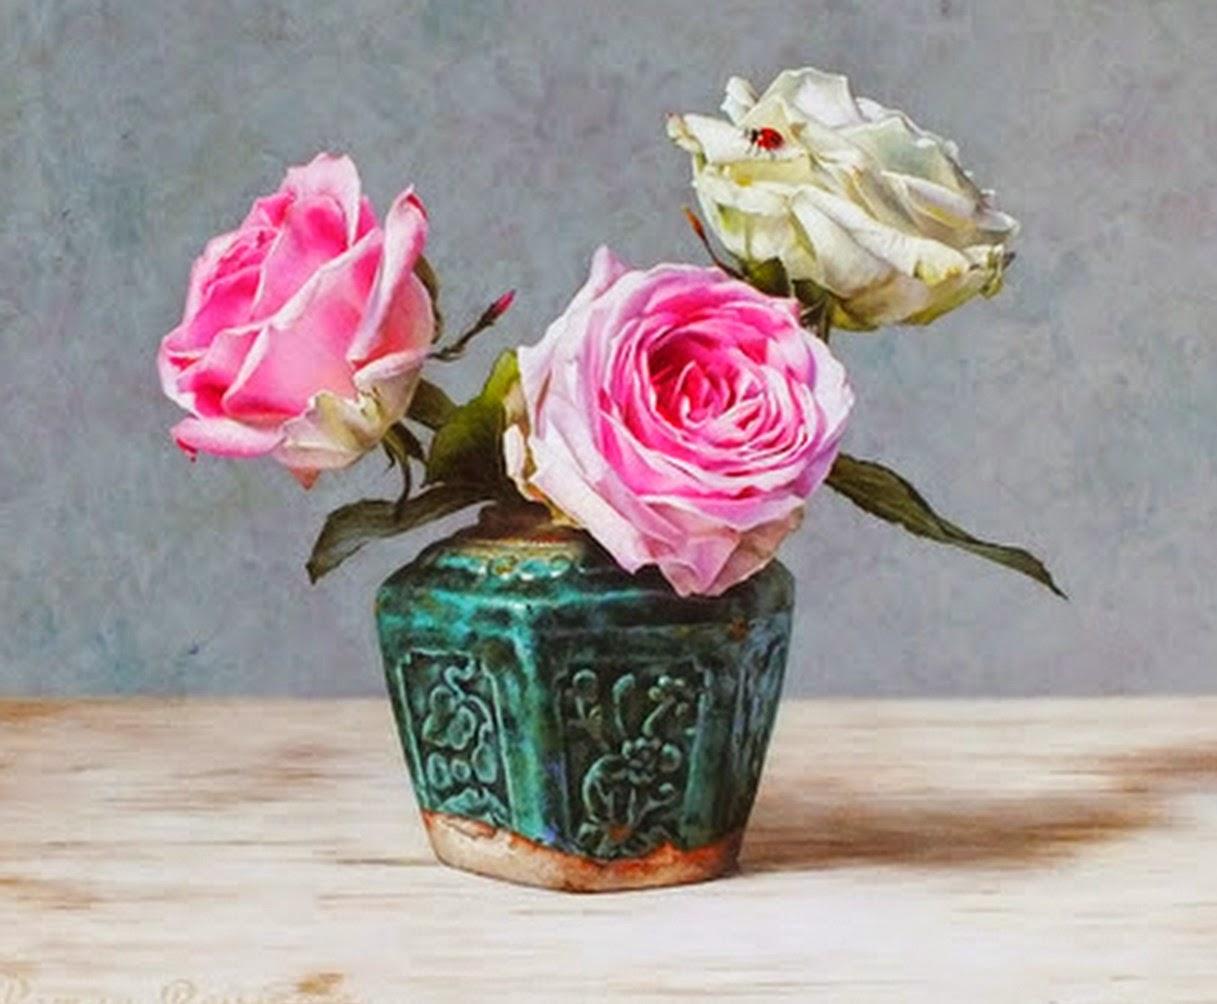 flores rosas naturales Descargar Fotos gratis Freepik - Imagenes De Flores De Rosas